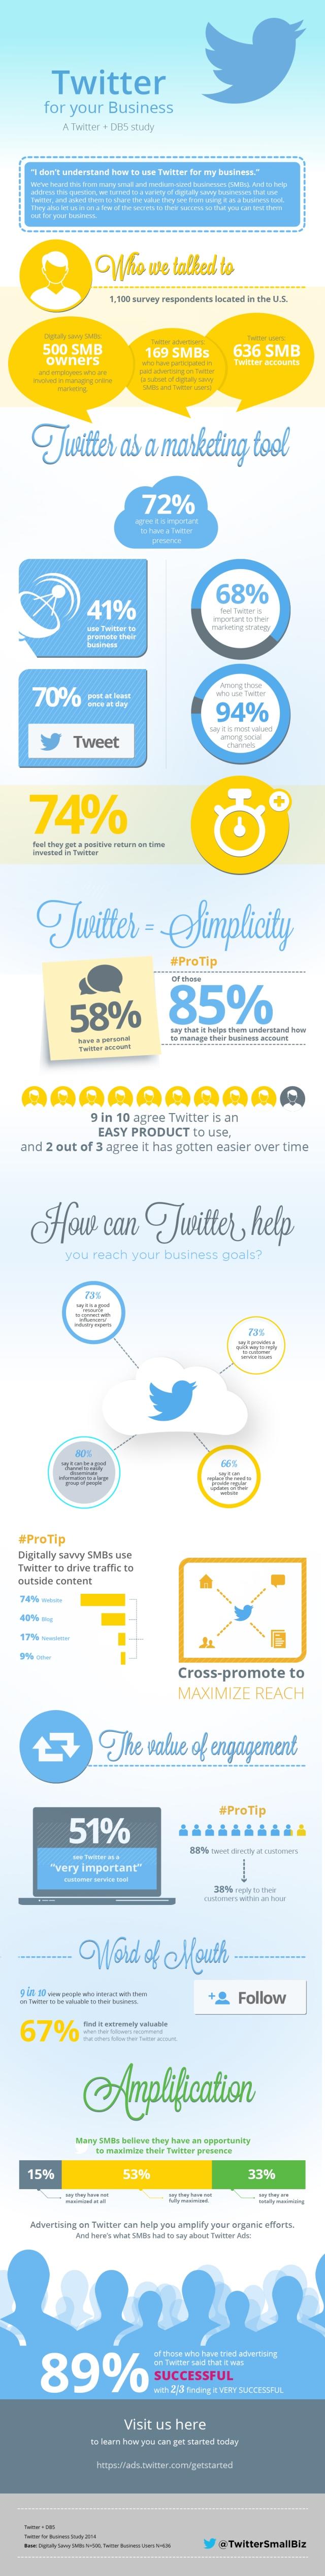 Estudio de Twitter para empresas